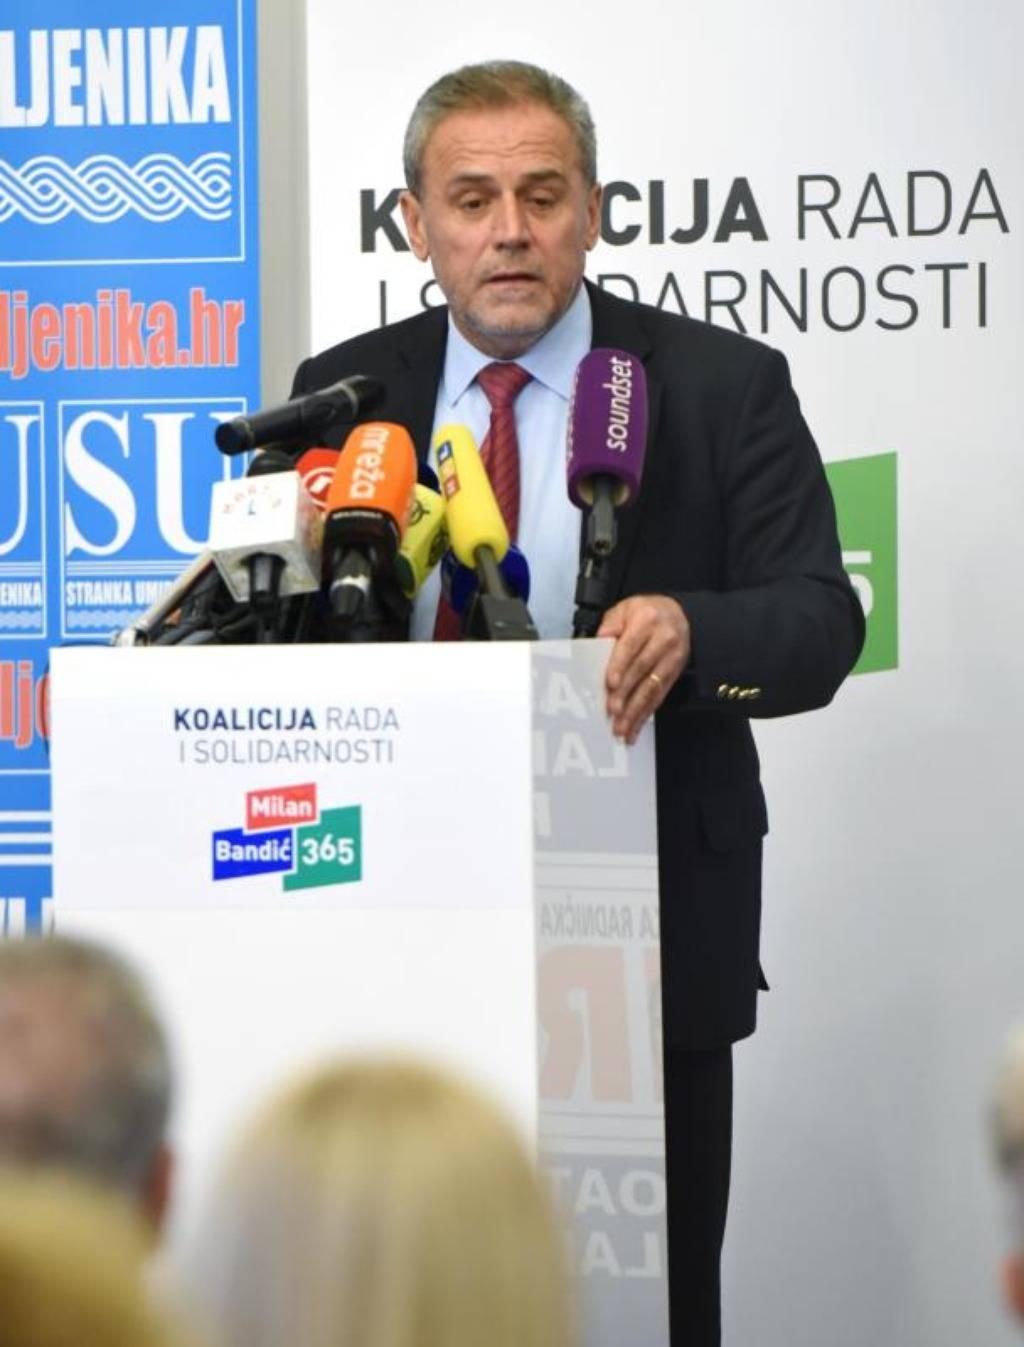 Marko Lukunić/PIXSELL